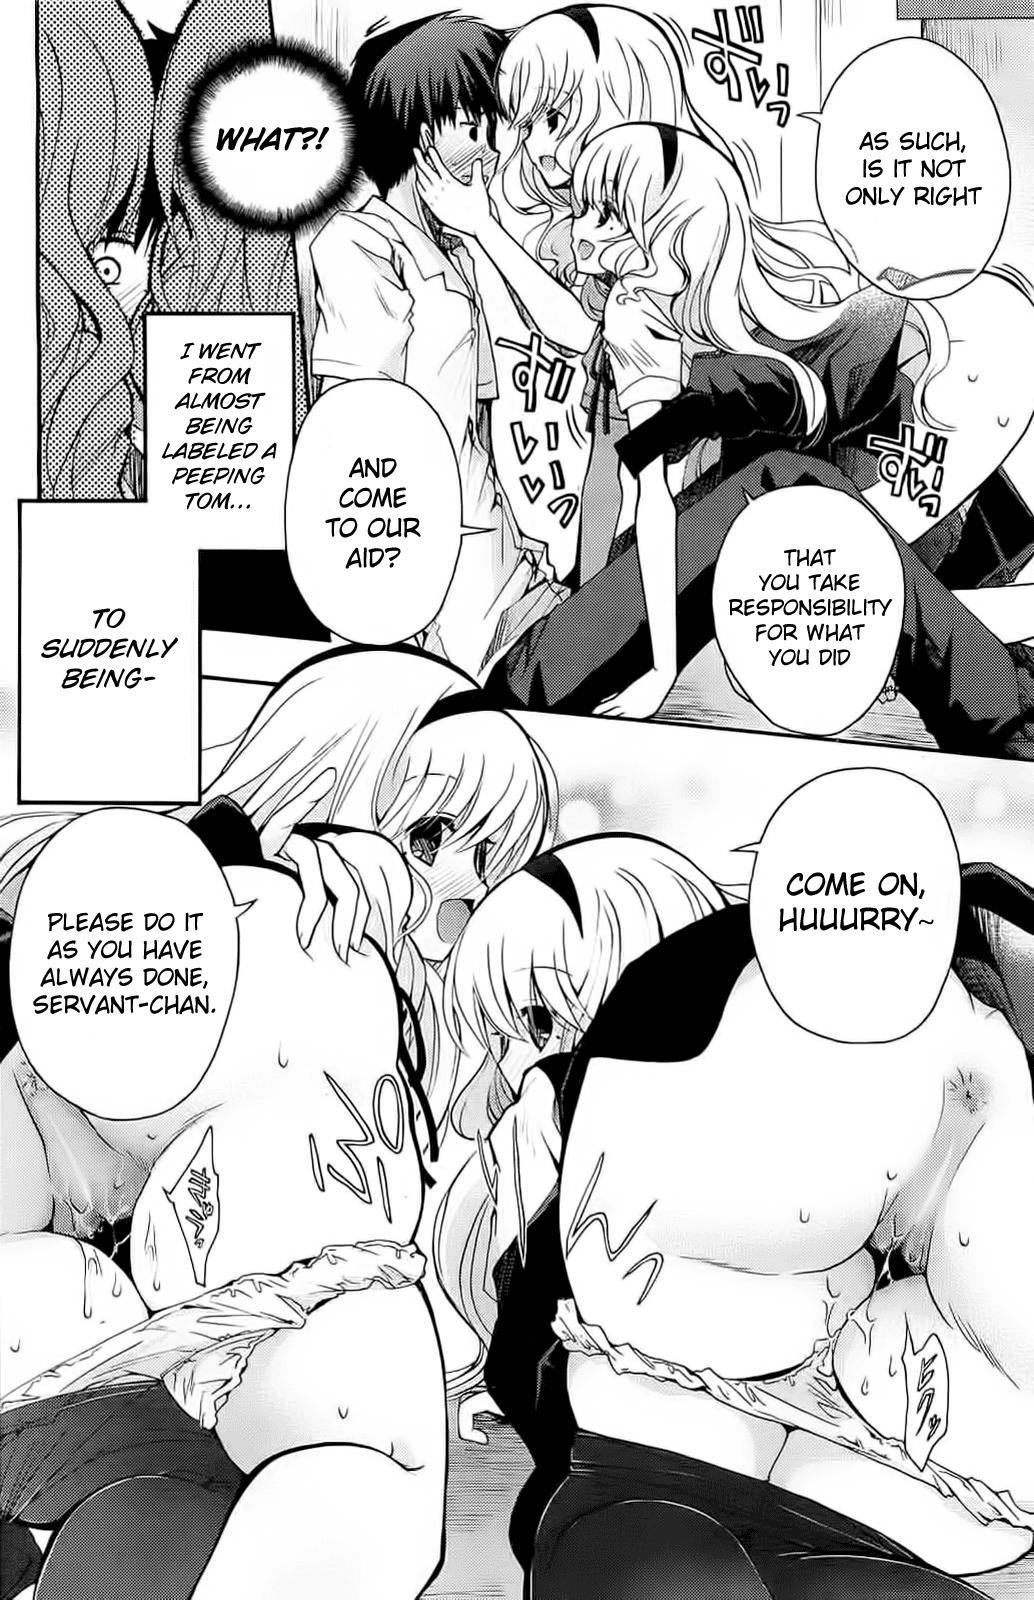 [Izumiya Otoha] Geboku-chan Sharing | Servant-chan Sharing (Comic Hotmilk 2013-09) [English] {The Lusty Lady Project} 7